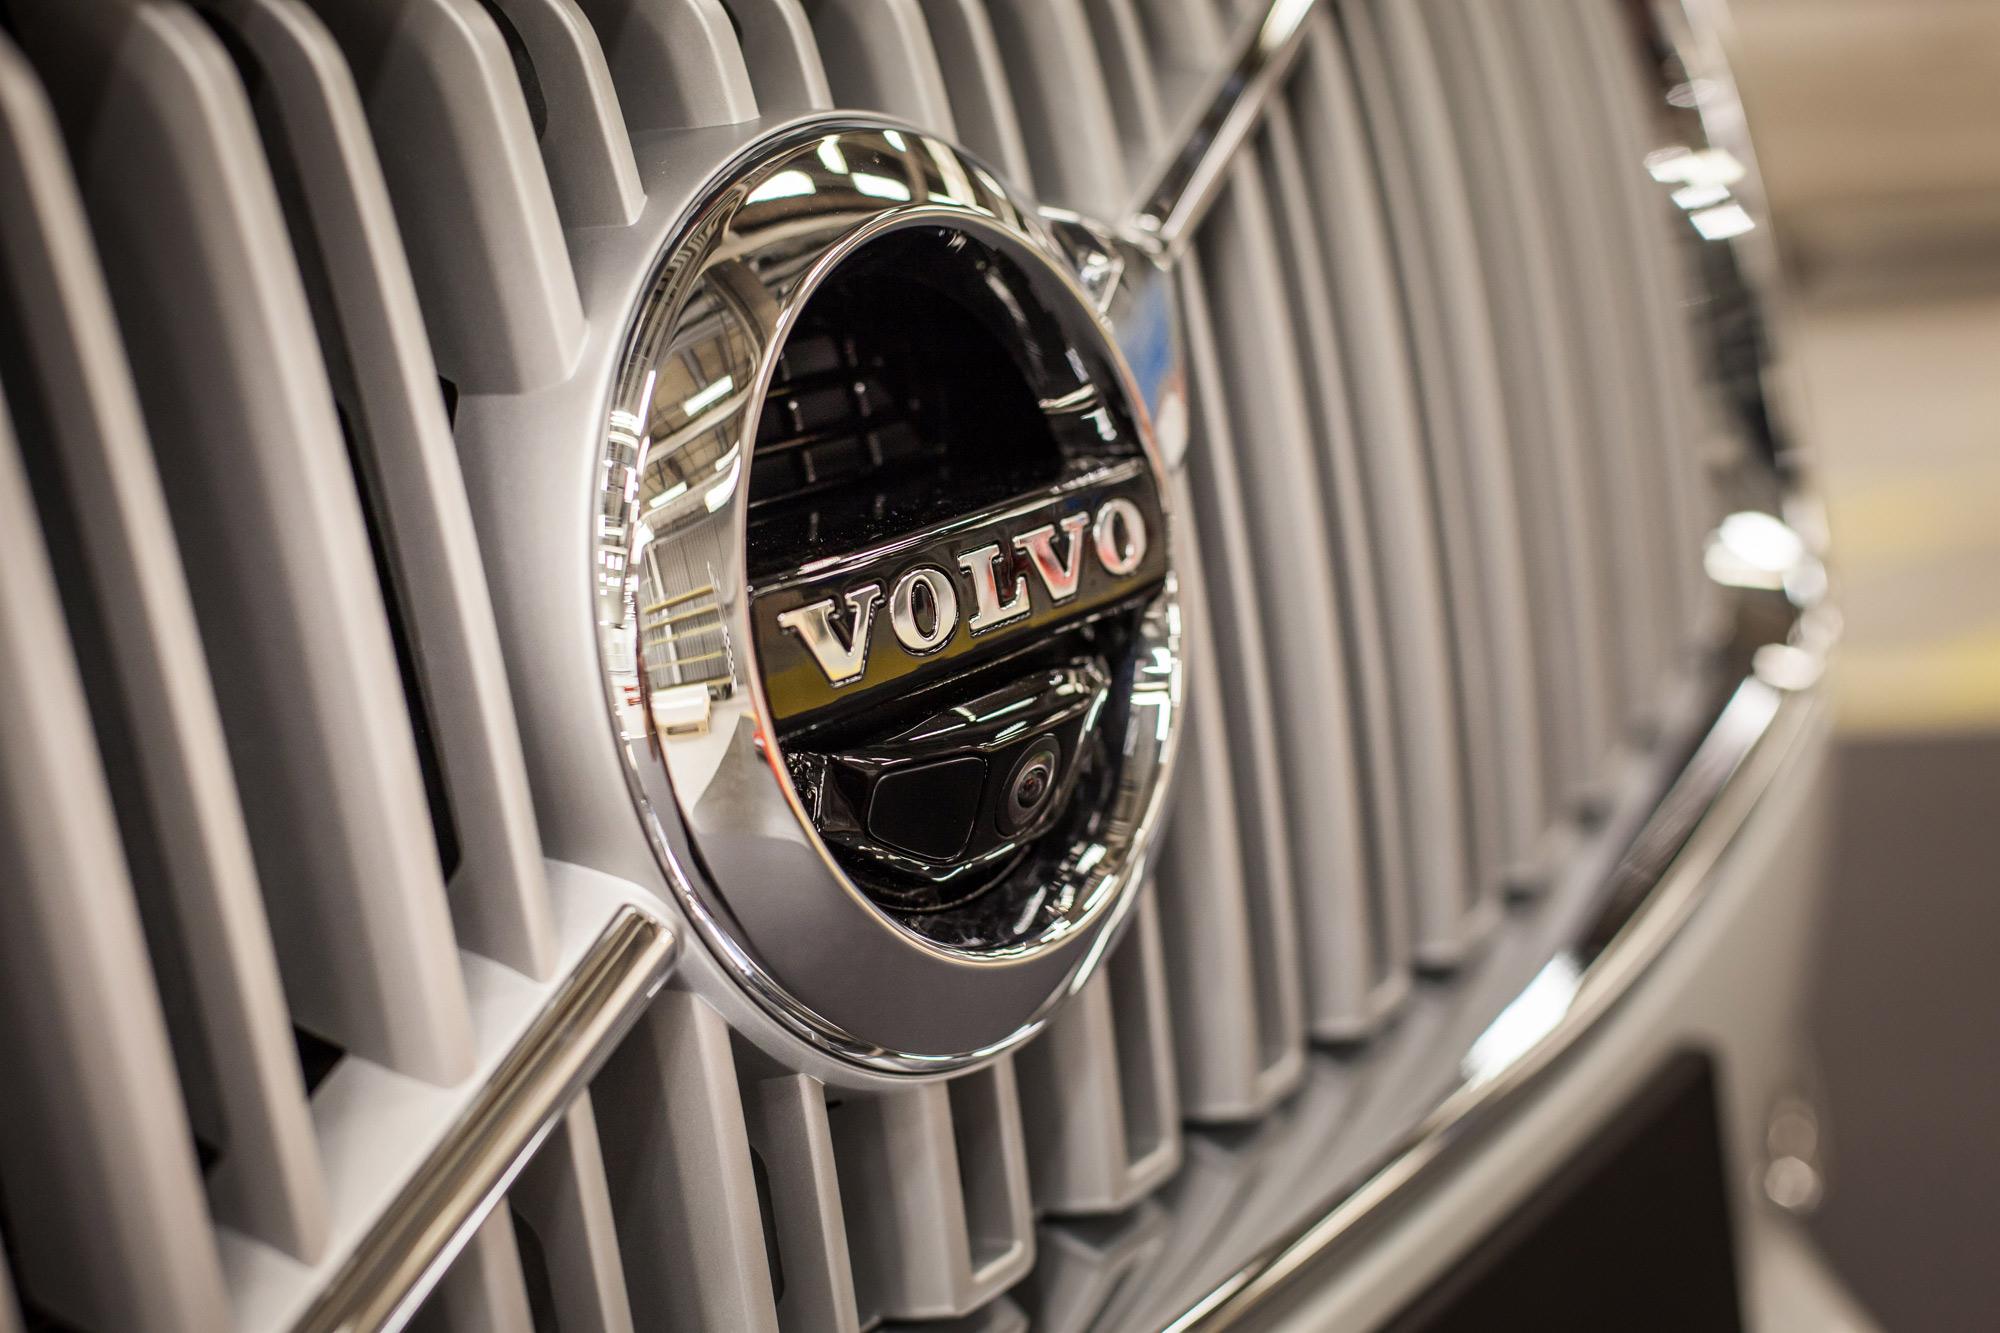 Volvo Drive Me 001 camera